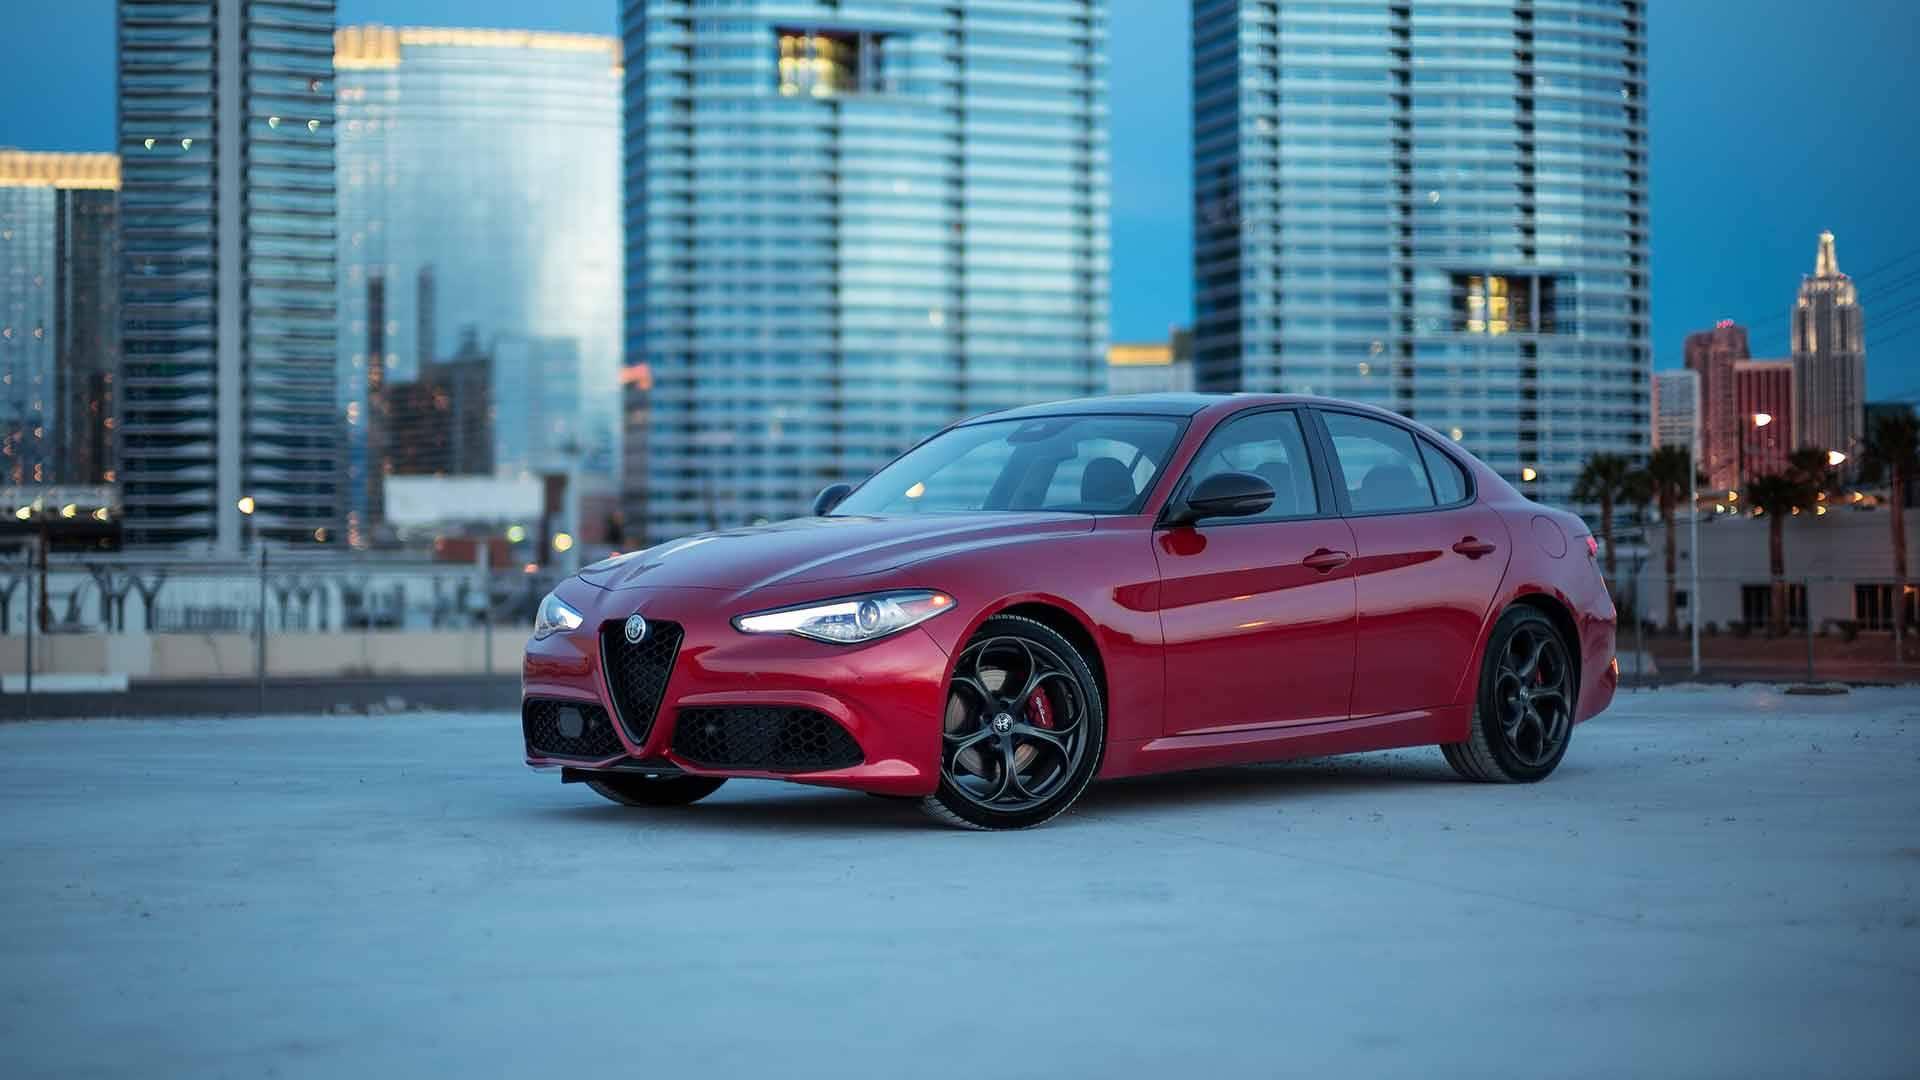 Alfa Romeo Giulia And Stelvio Go Dark With New Nero Edizione Packs